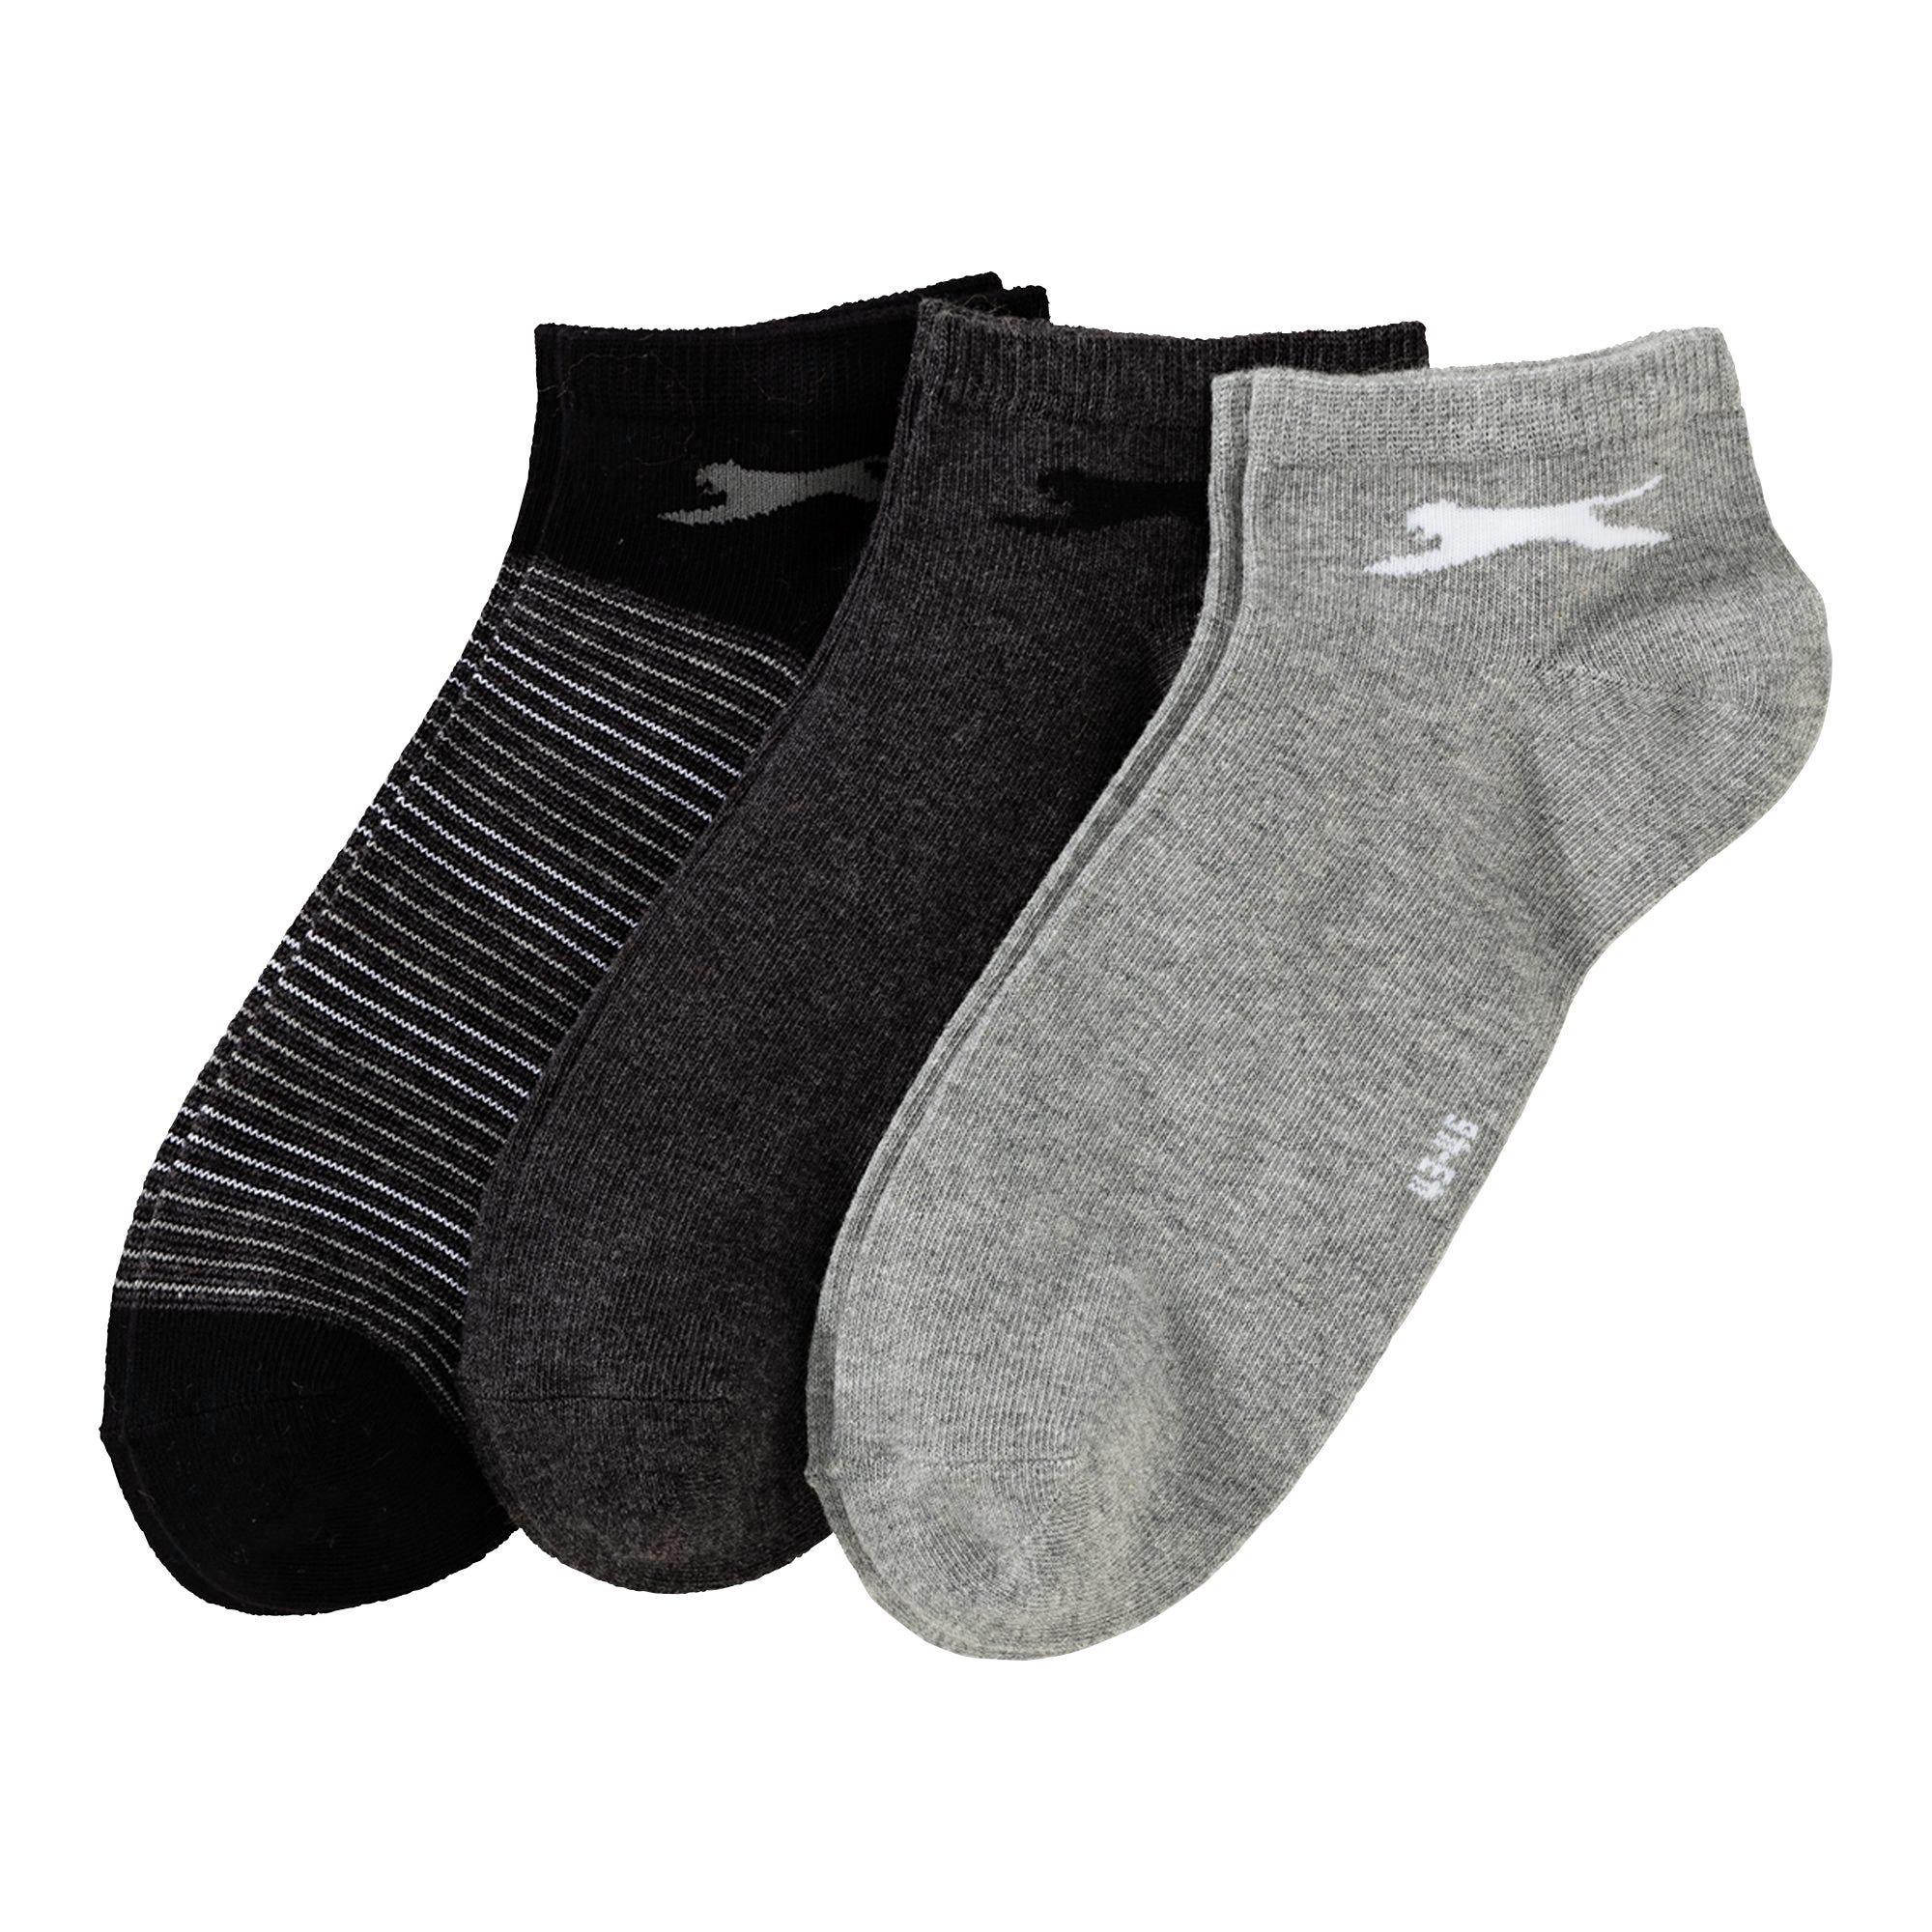 Nr:1239 4*8*12*16* He.S Sneaker Socker Freizeit   Socks für Männer